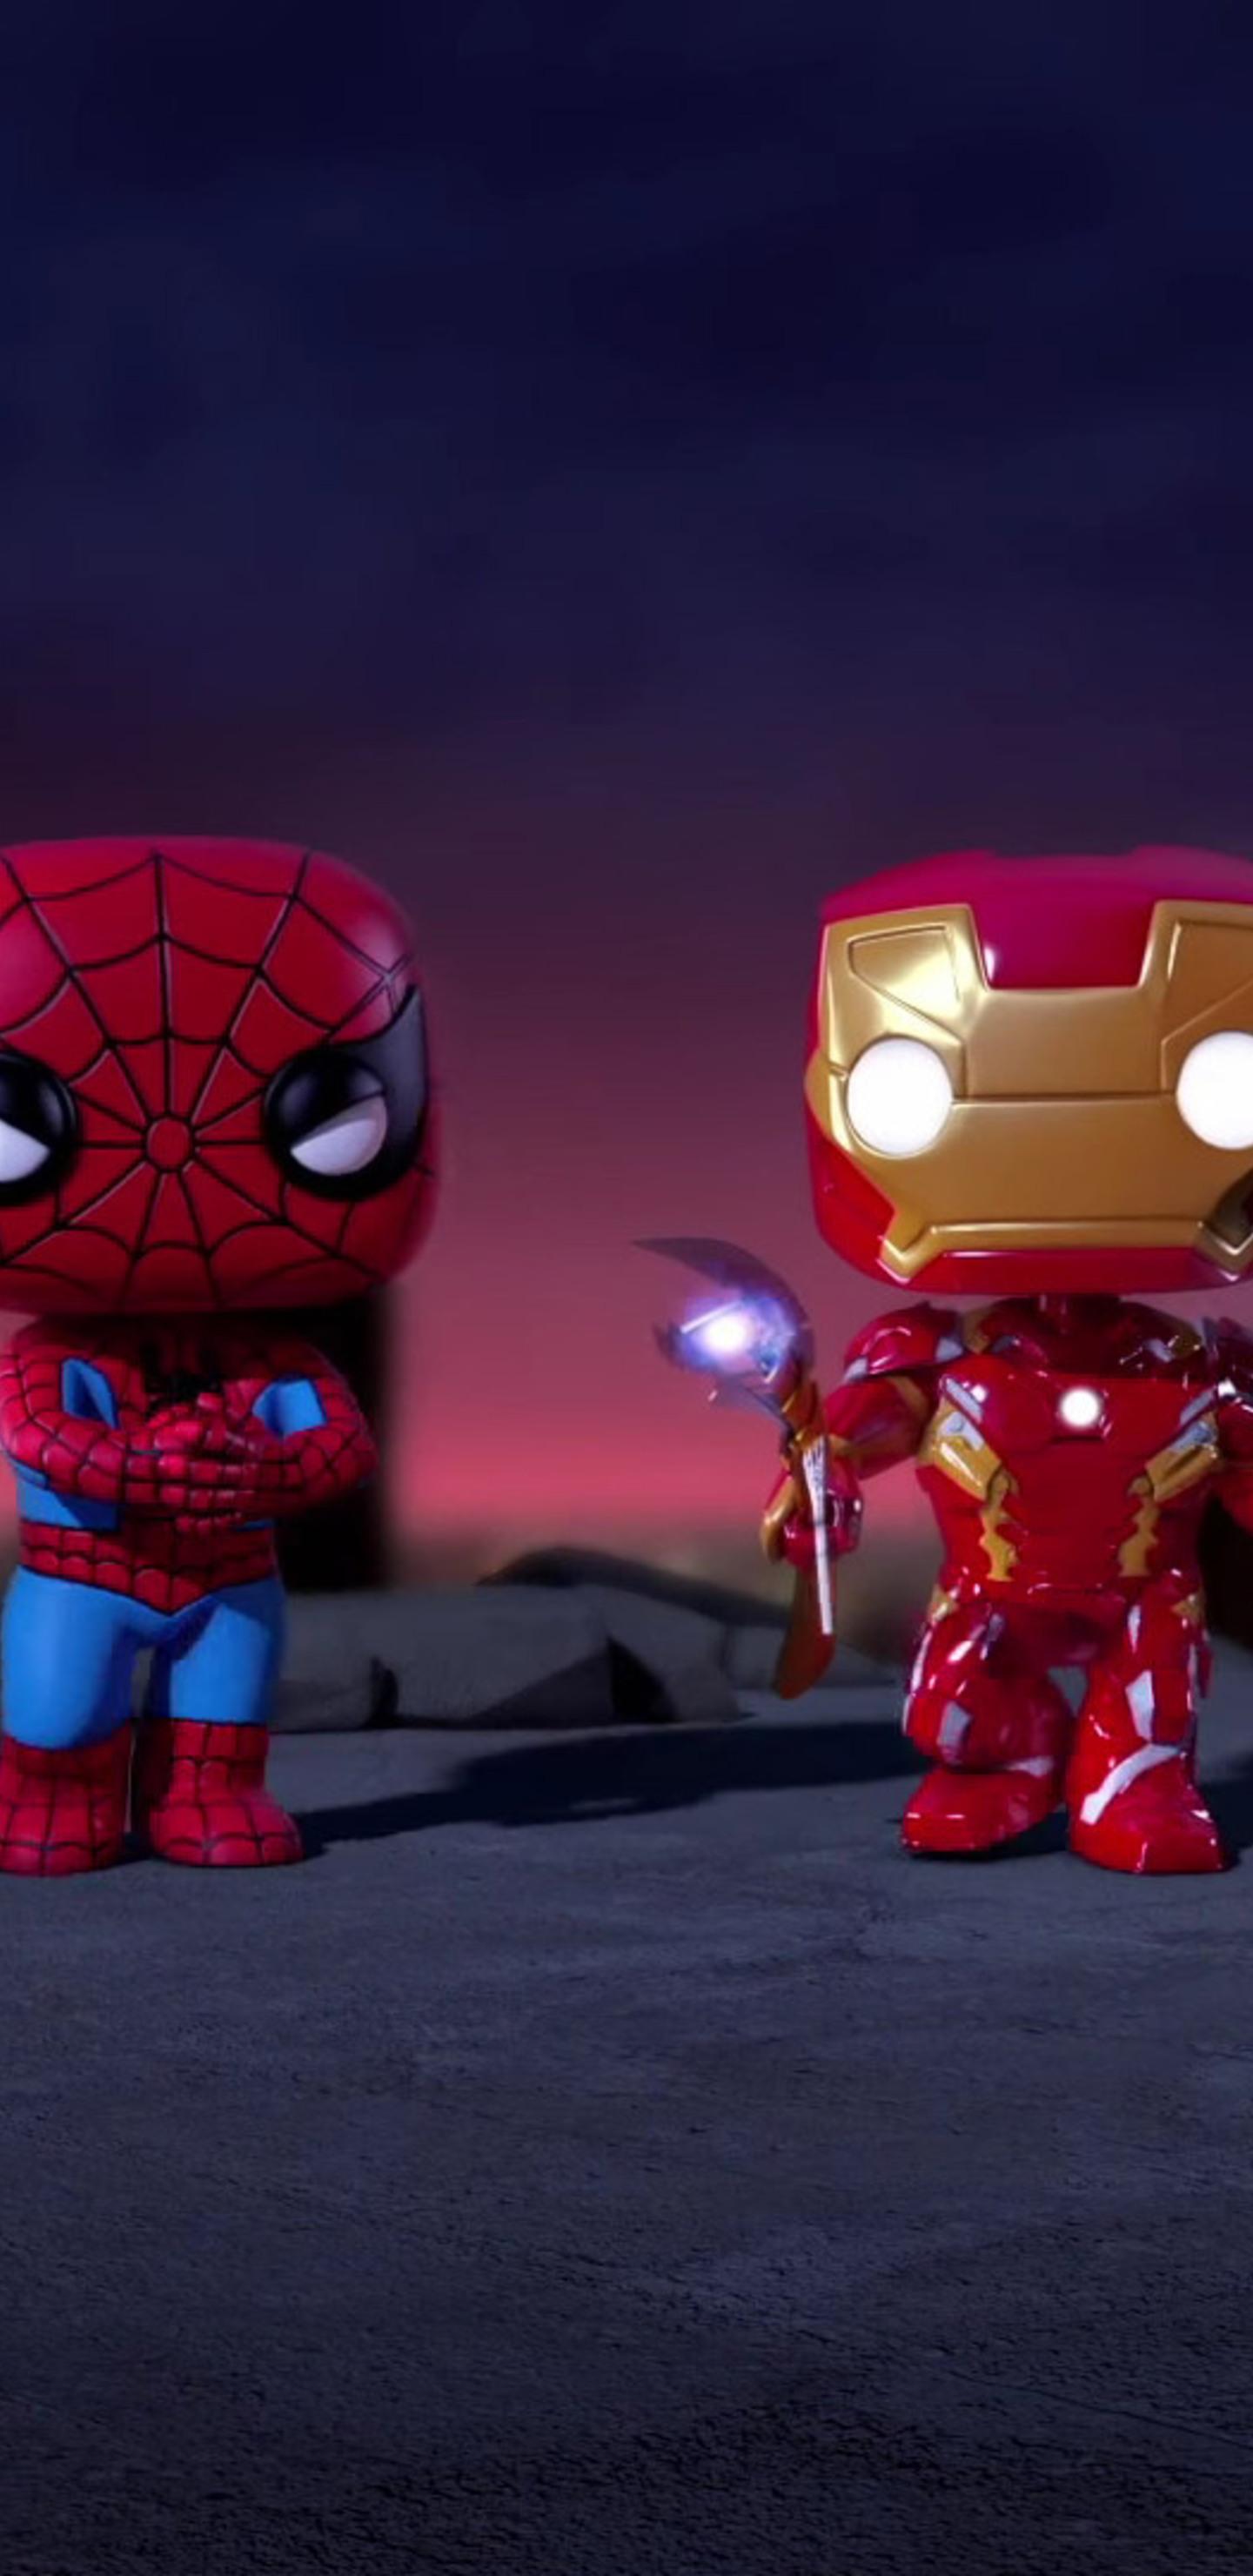 1440x2960 Iron Man And Spiderman Spellbound Animated Movie